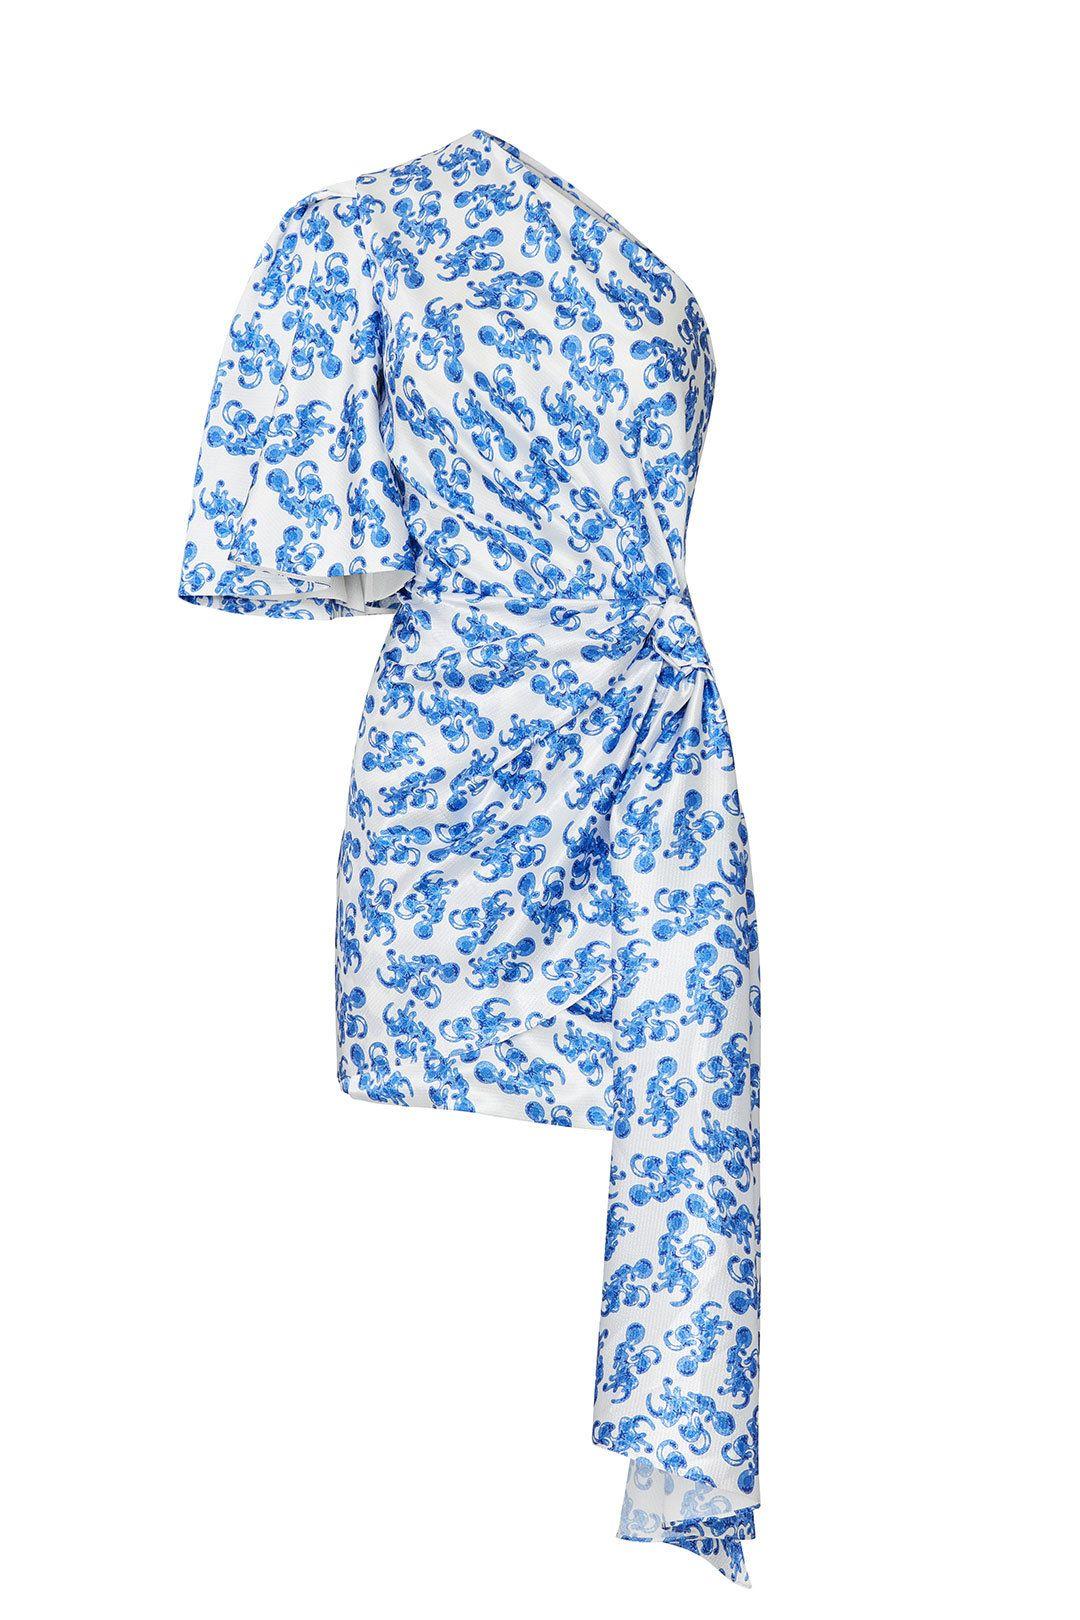 Solace London Printed Marcie Dress Dresses London Print Solace London